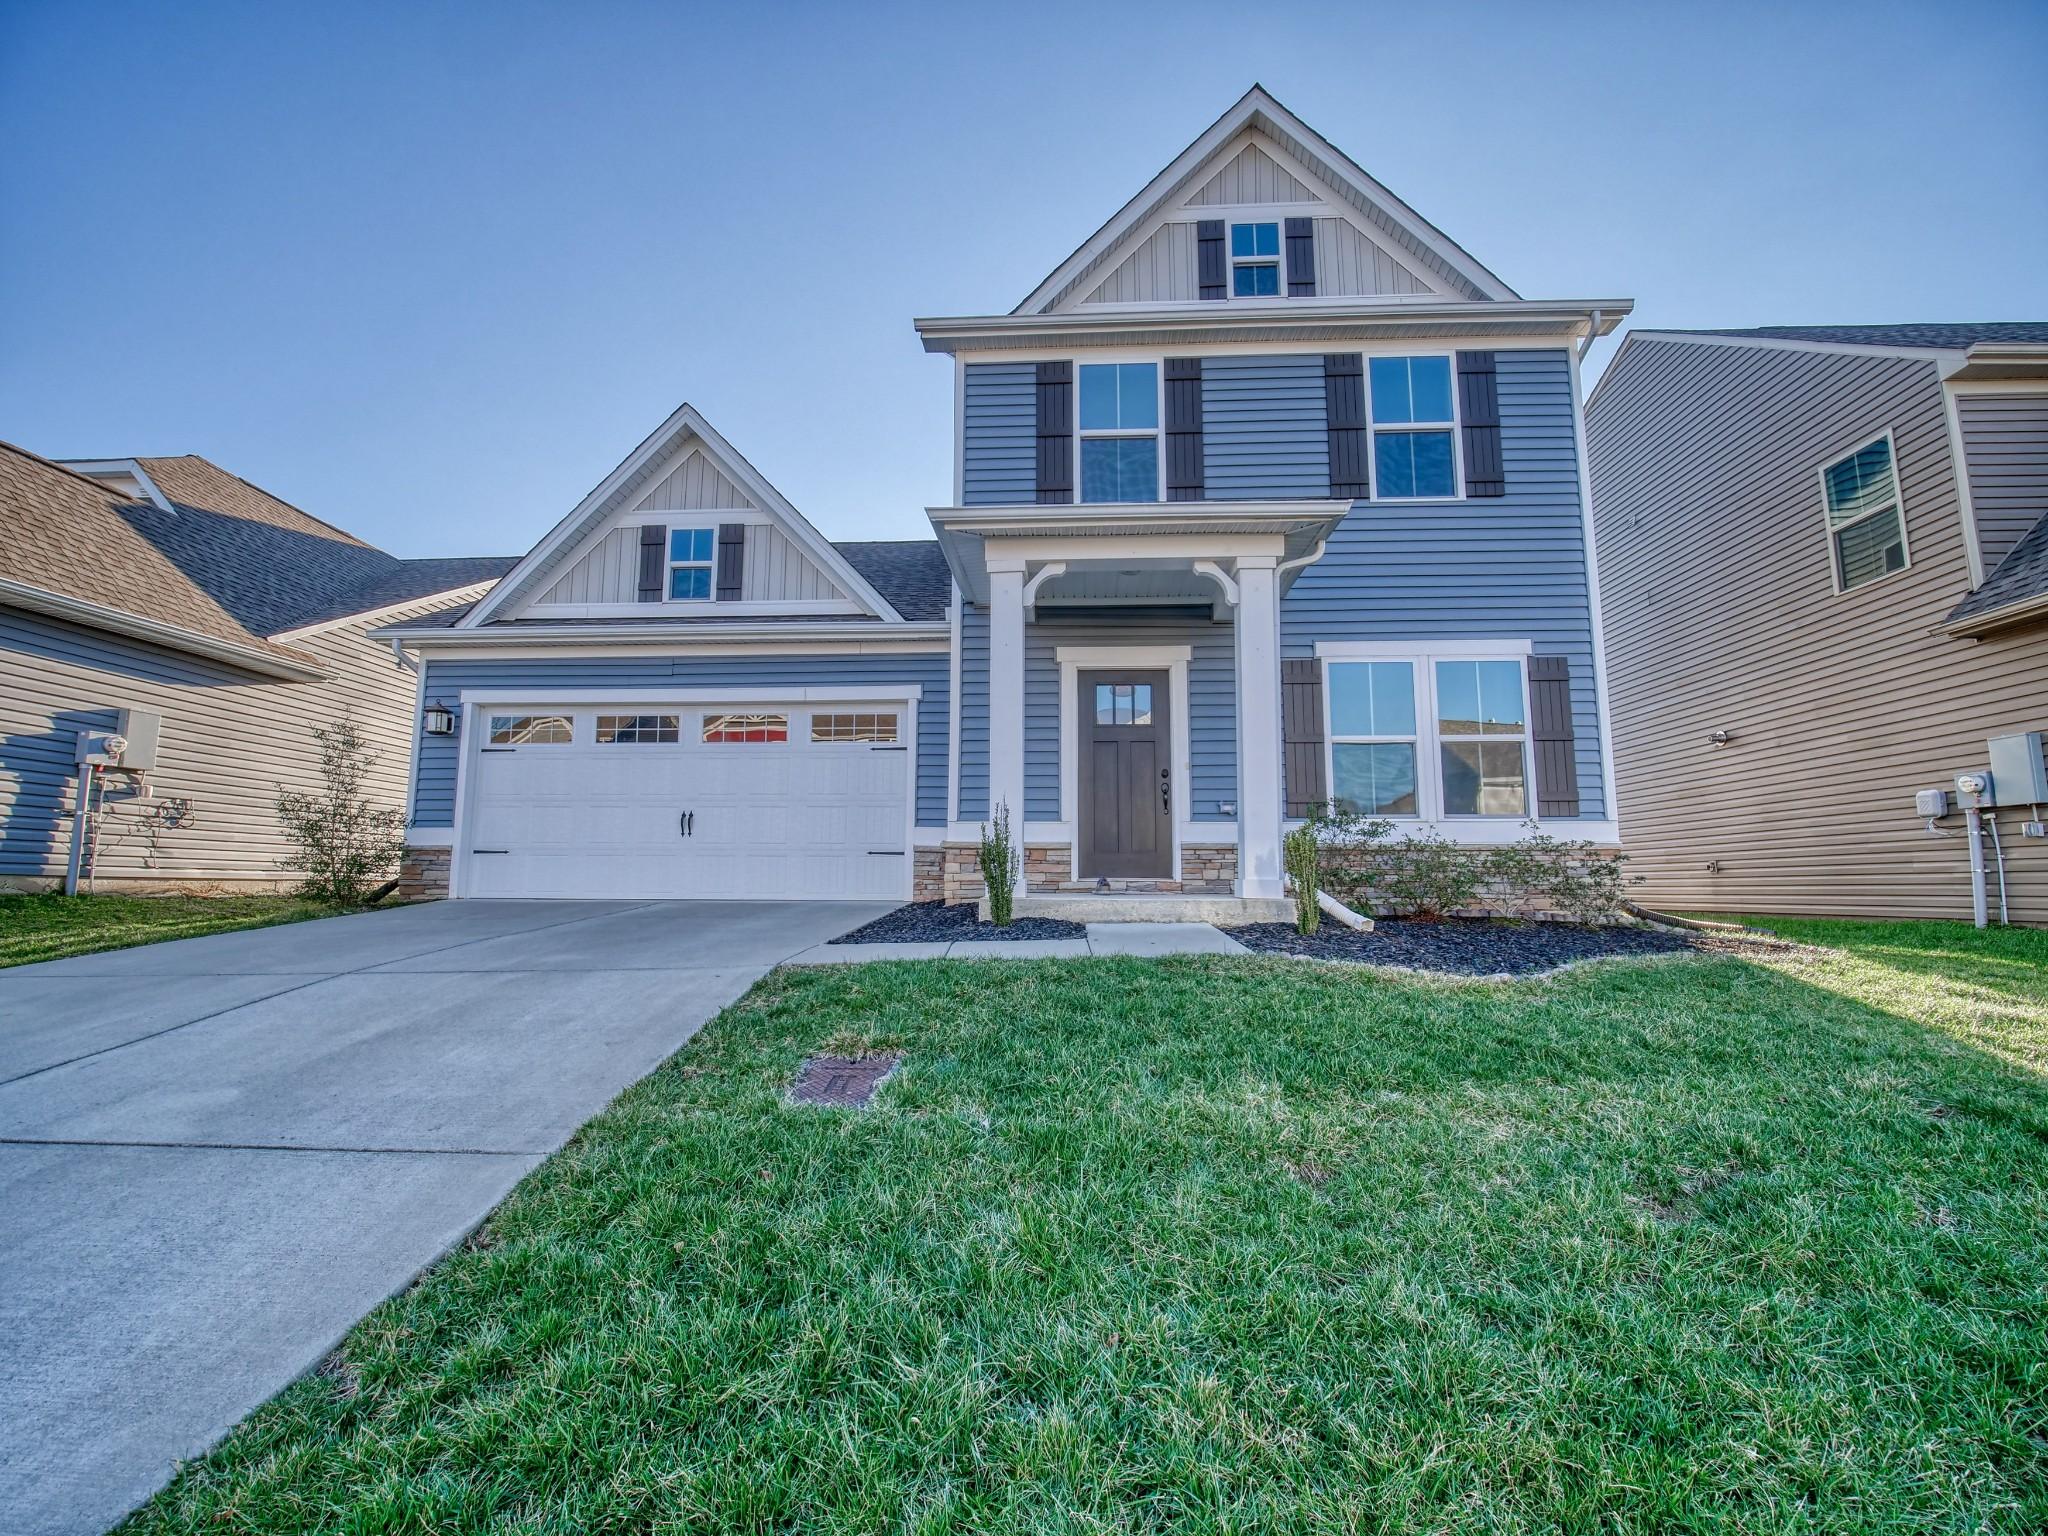 2033 Leeds LN, Nashville, TN 37221 - Nashville, TN real estate listing